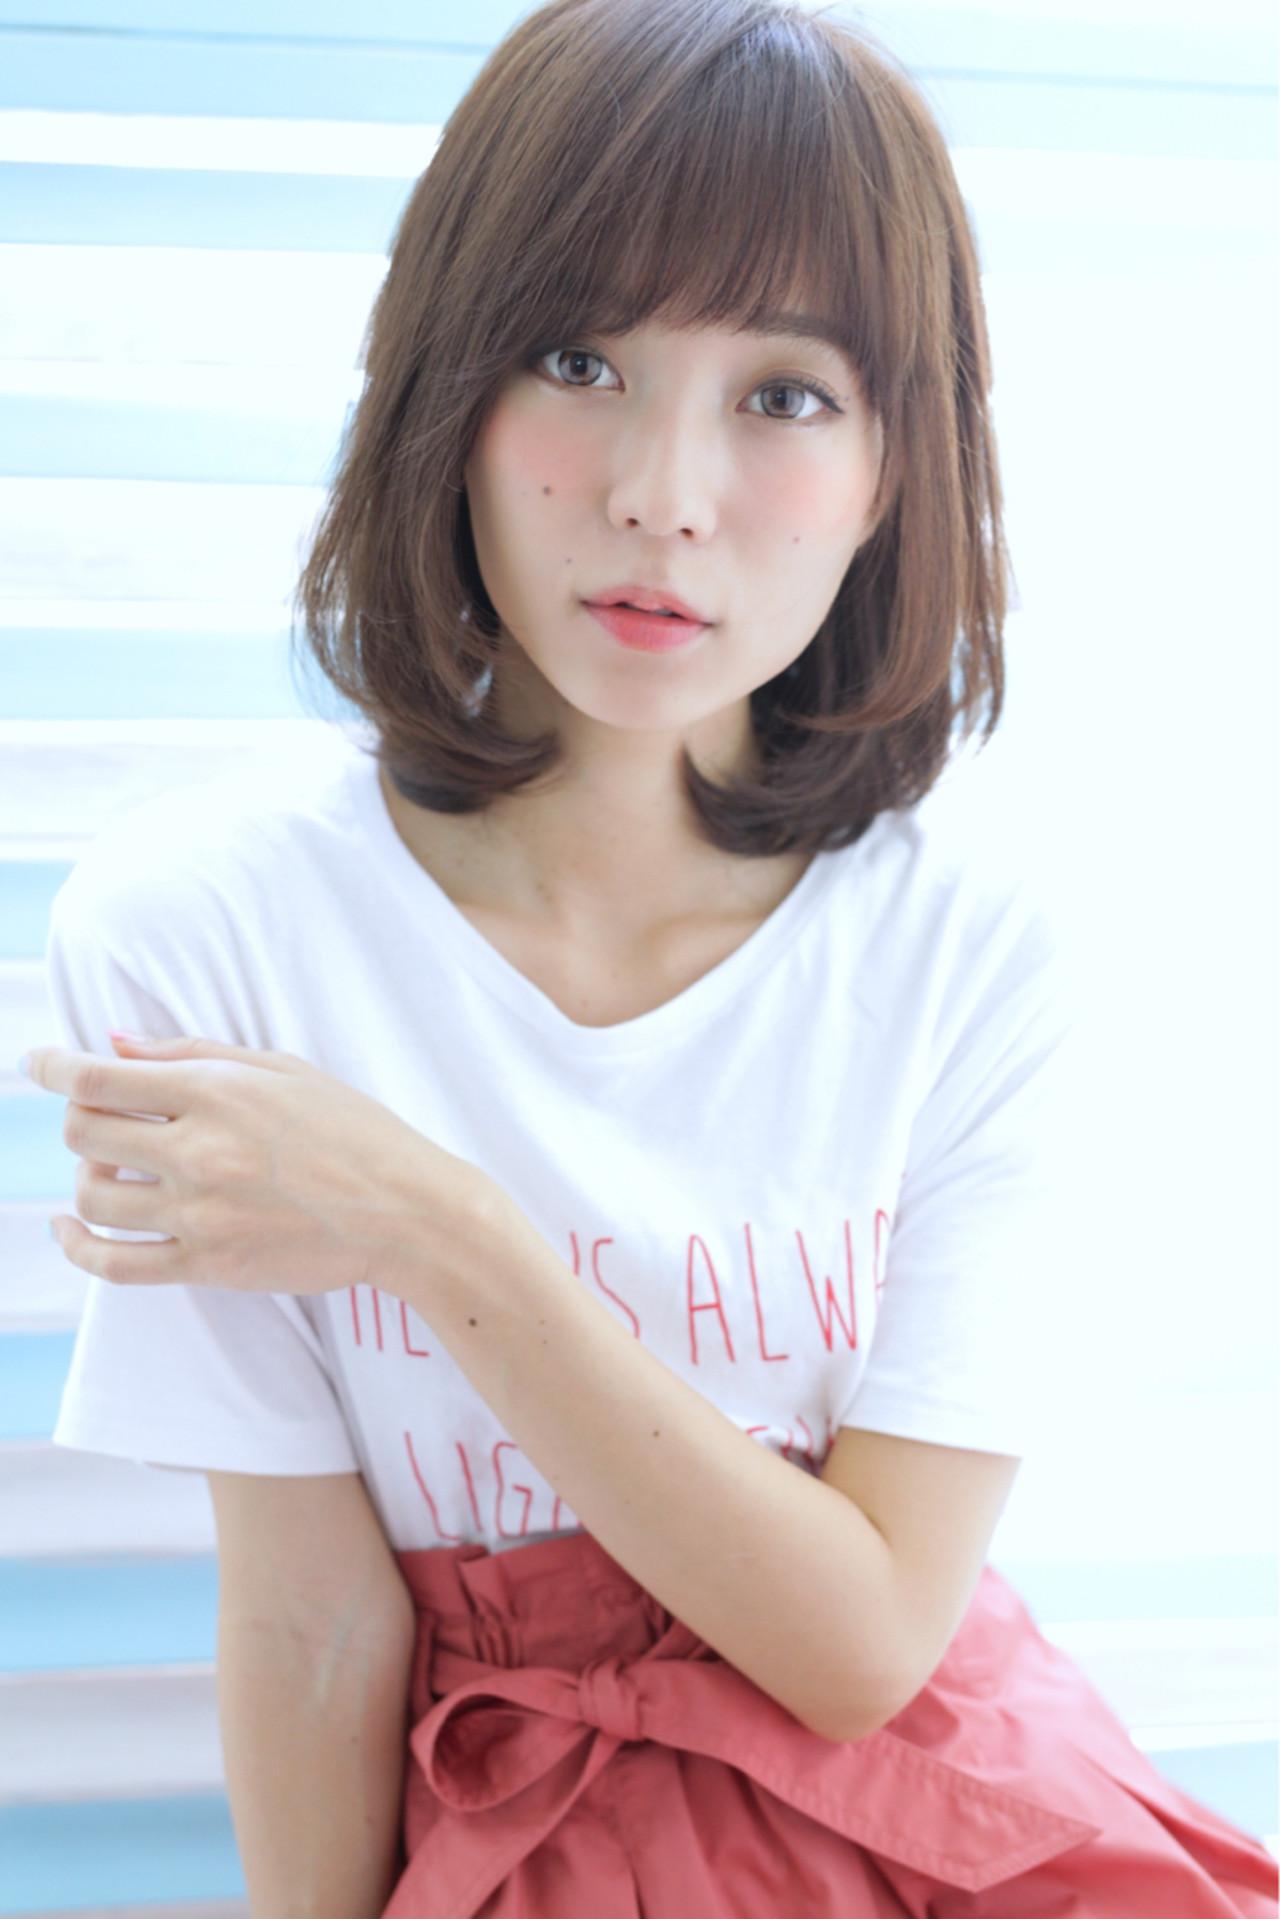 a11d92c59e76 浴衣に合わせたいミディアムヘアの夏っぽアレンジ大特集♡ (HAIR) - LINE ...